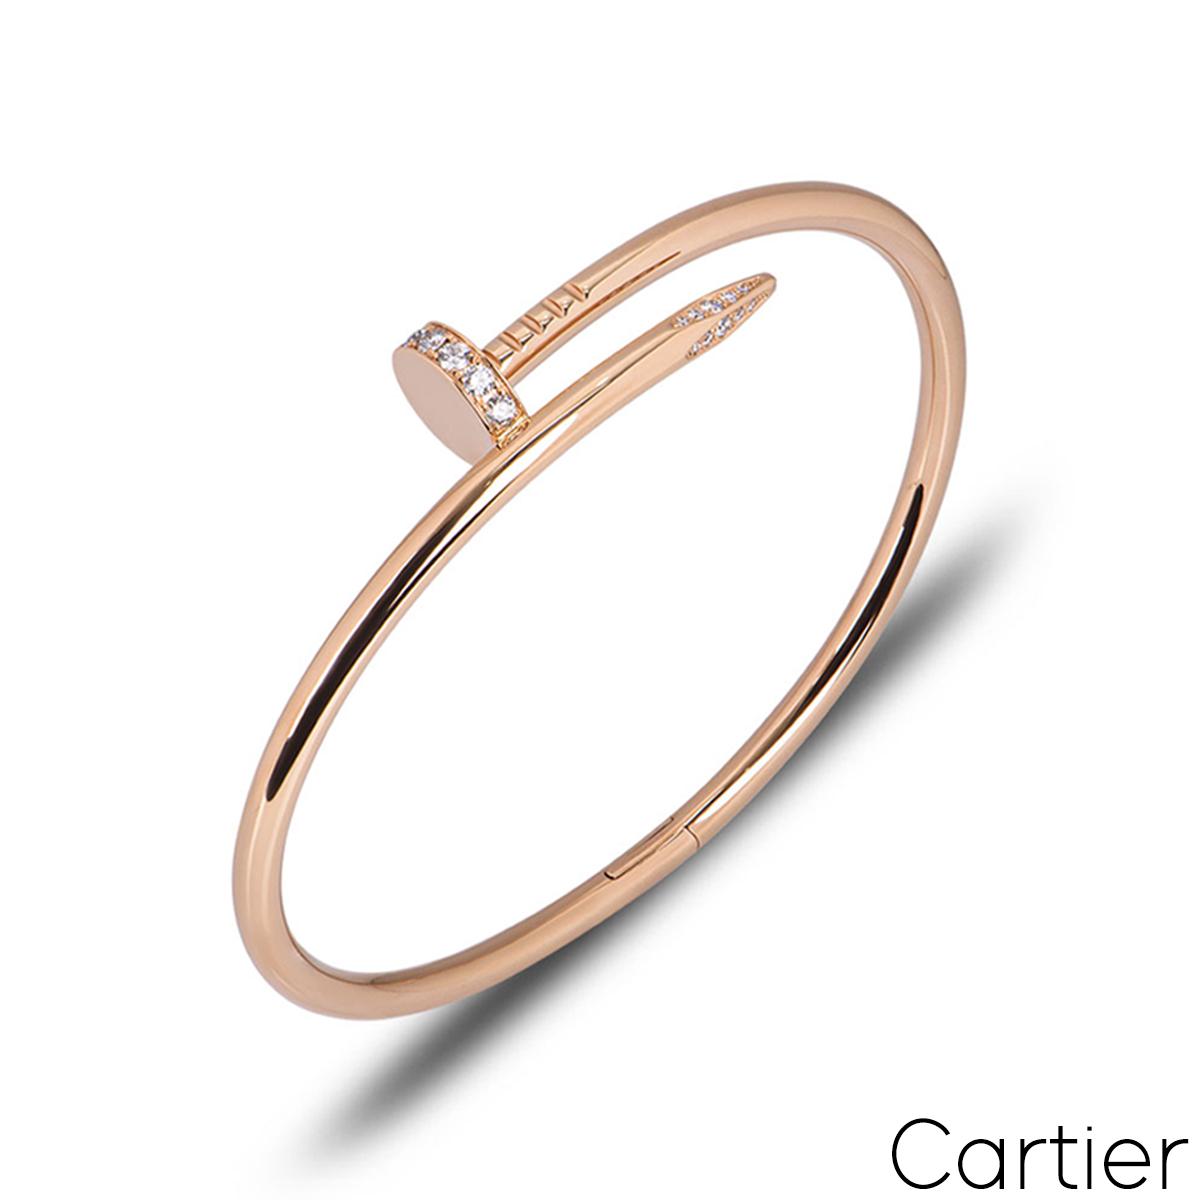 Cartier Rose Gold Diamond Juste Un Clou Bracelet Size 19 B6048519